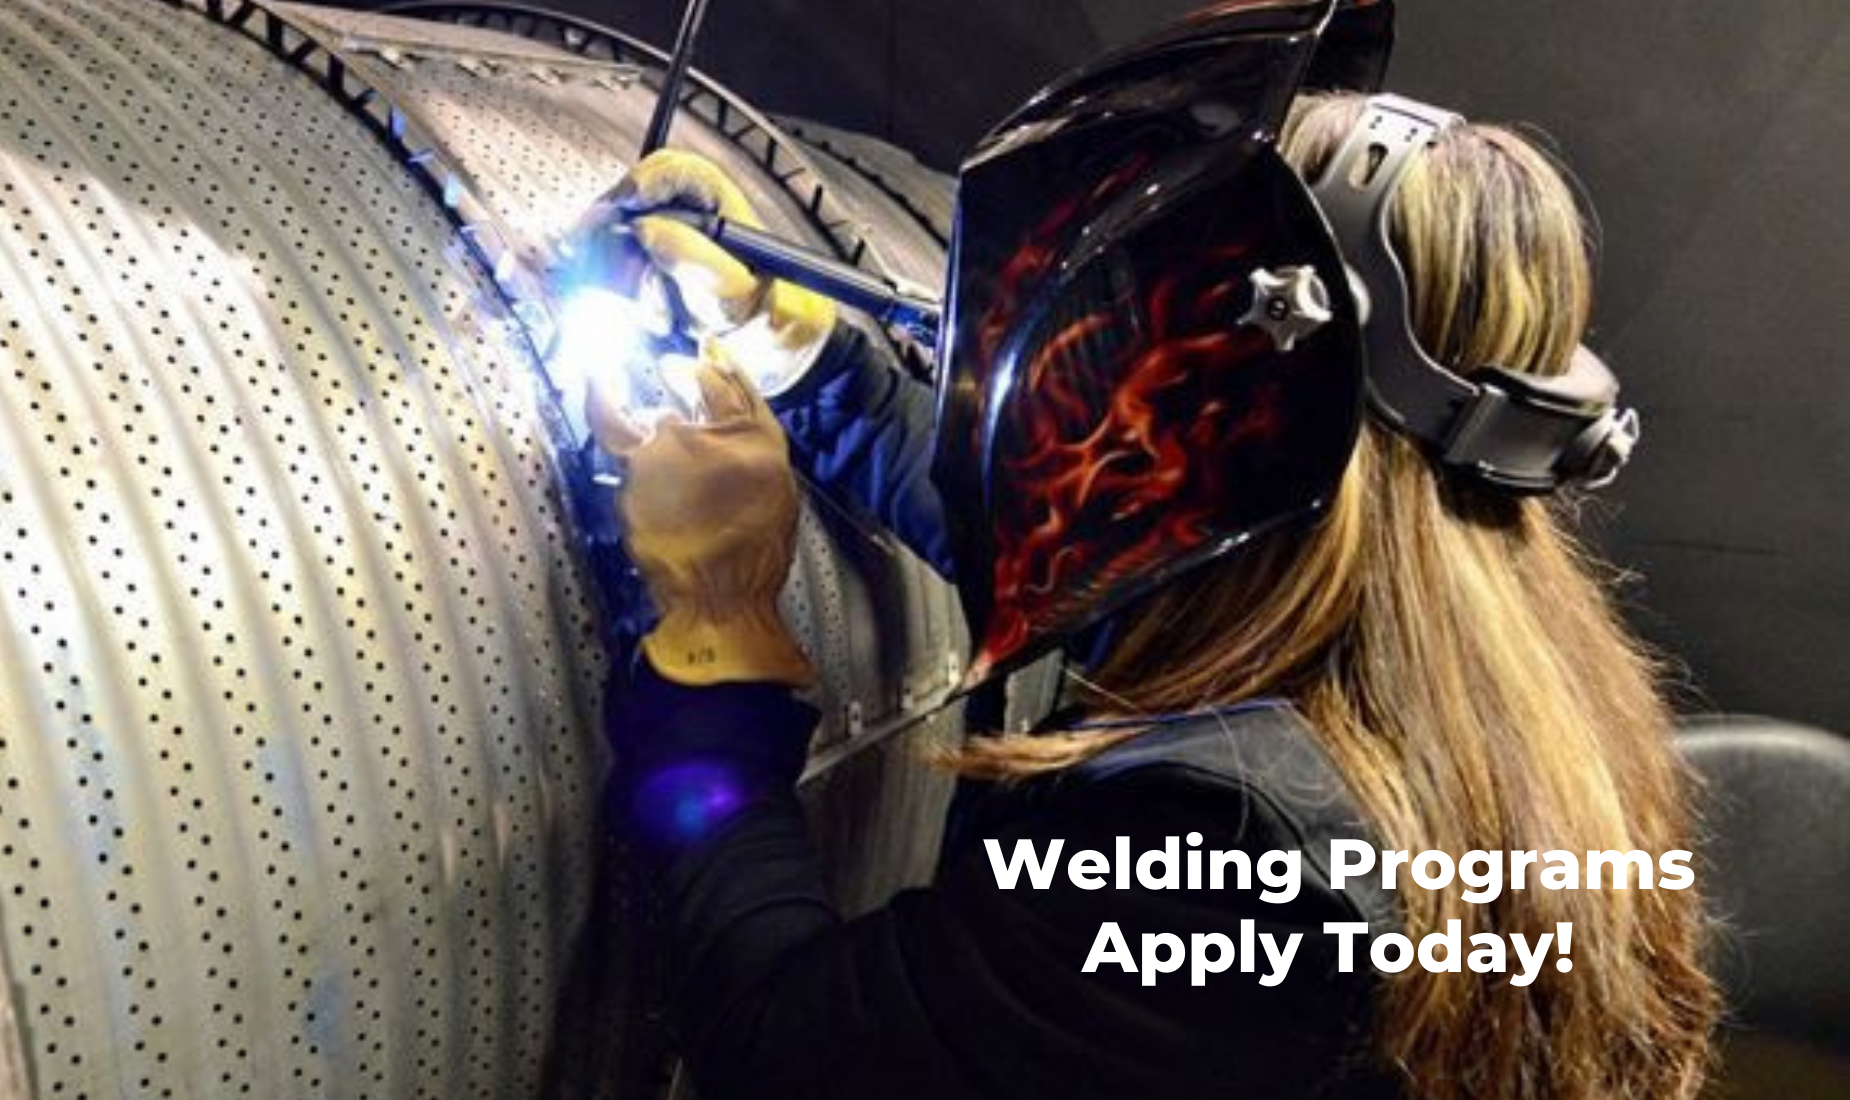 Welding program for adults